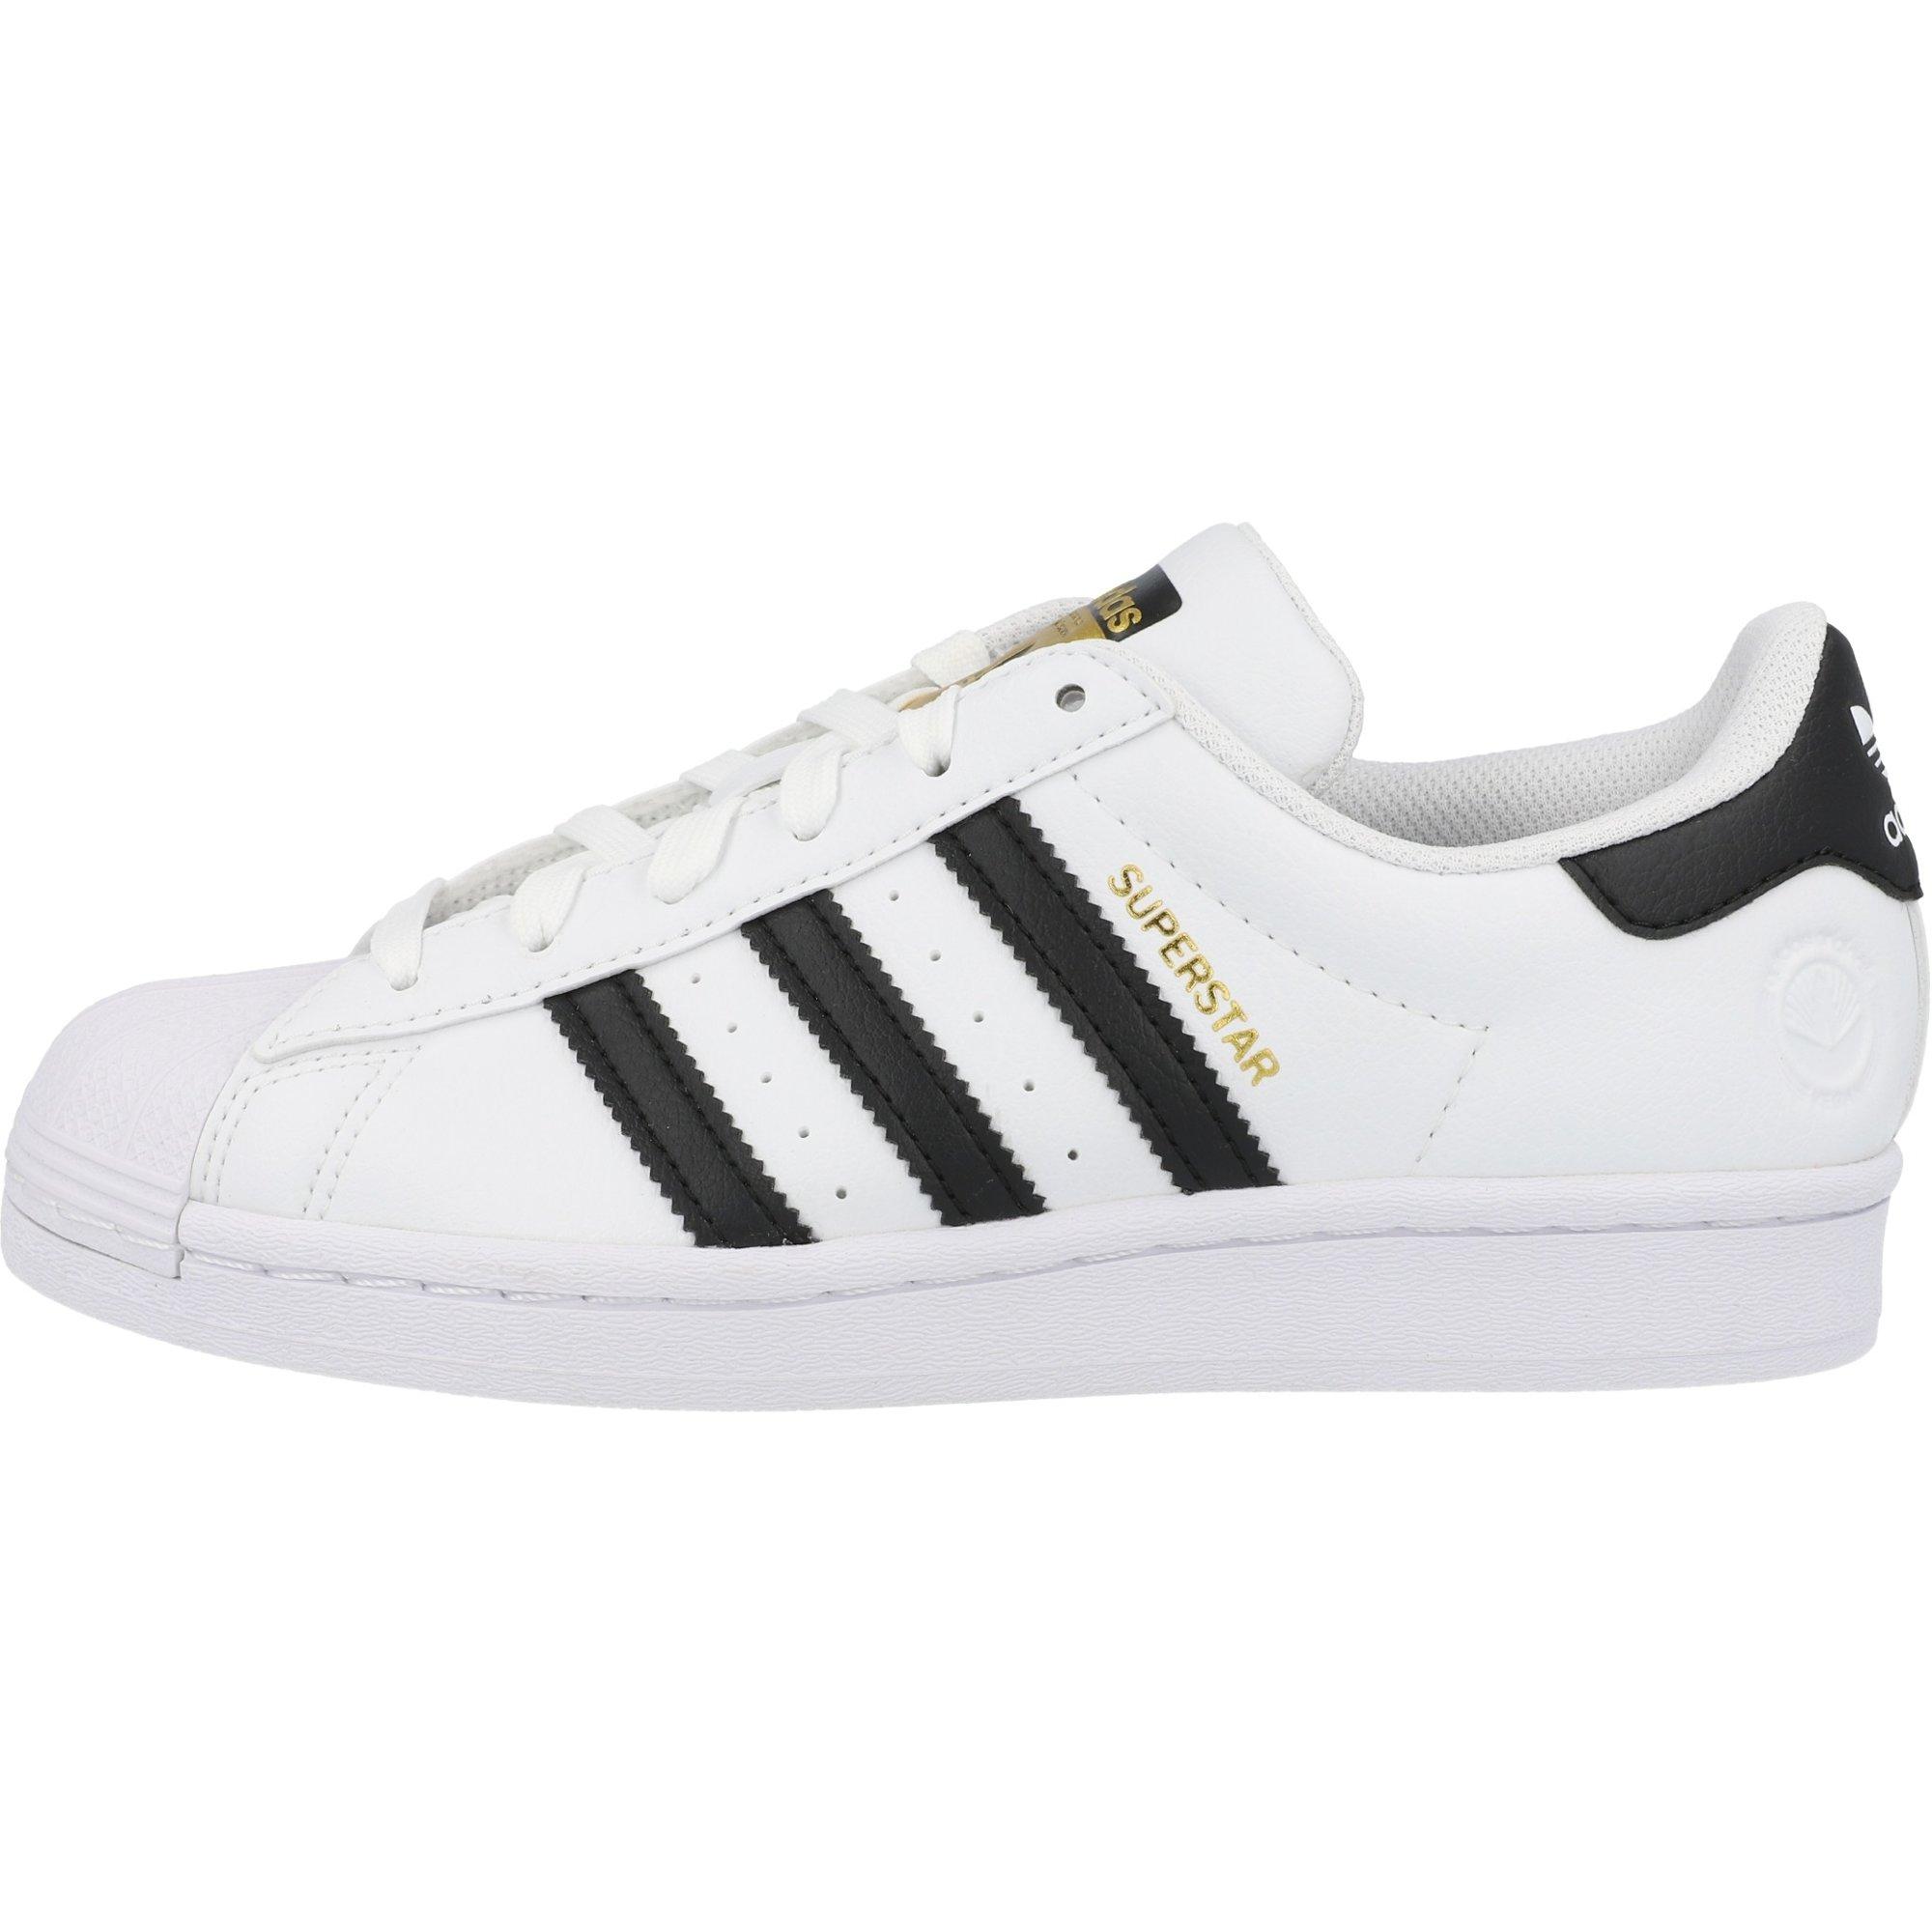 adidas Originals Superstar Vegan White/Core Black Synthetic